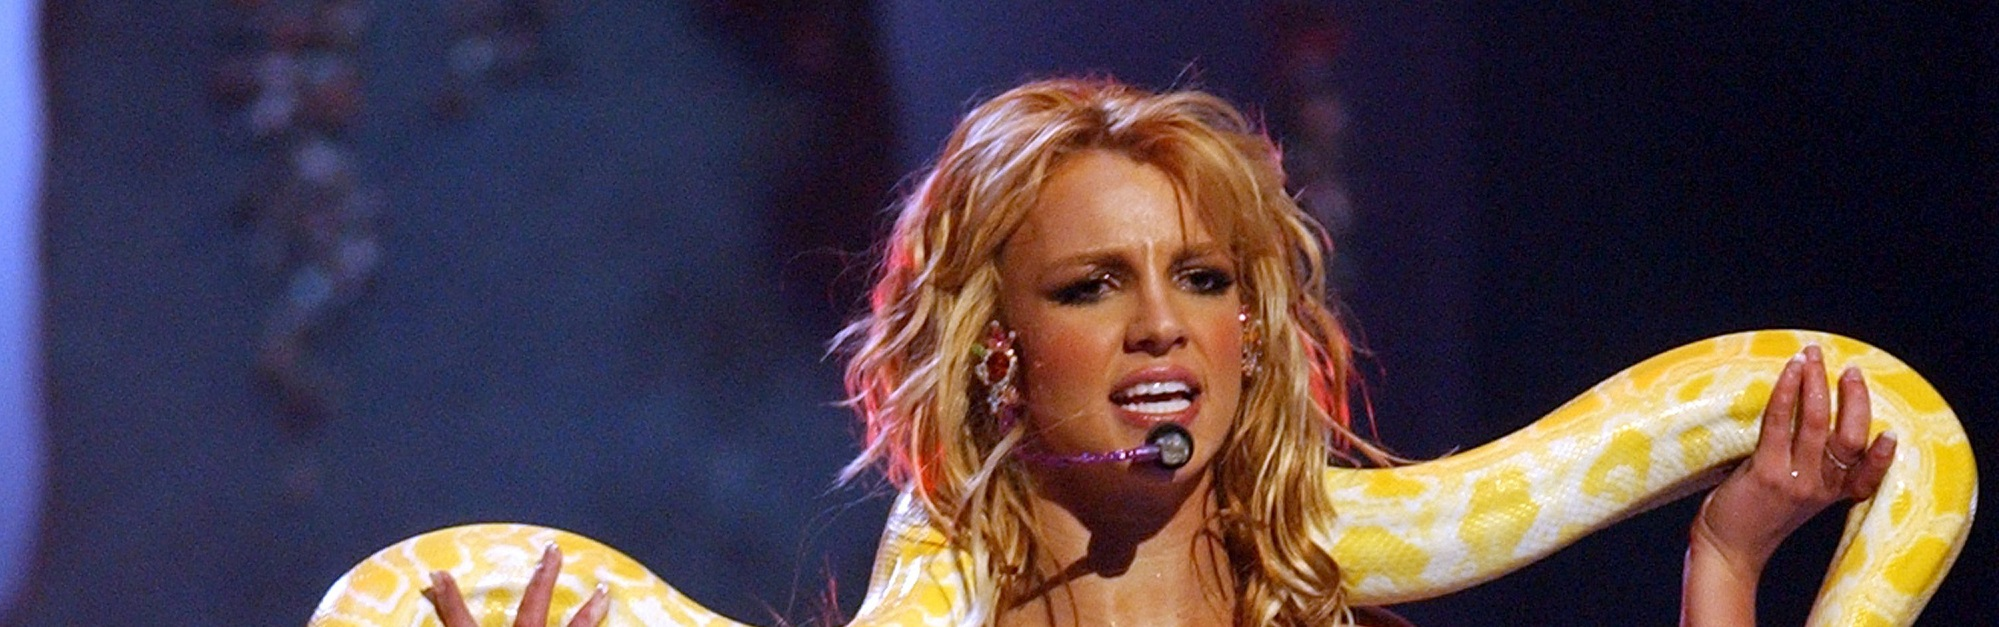 Britney spears header